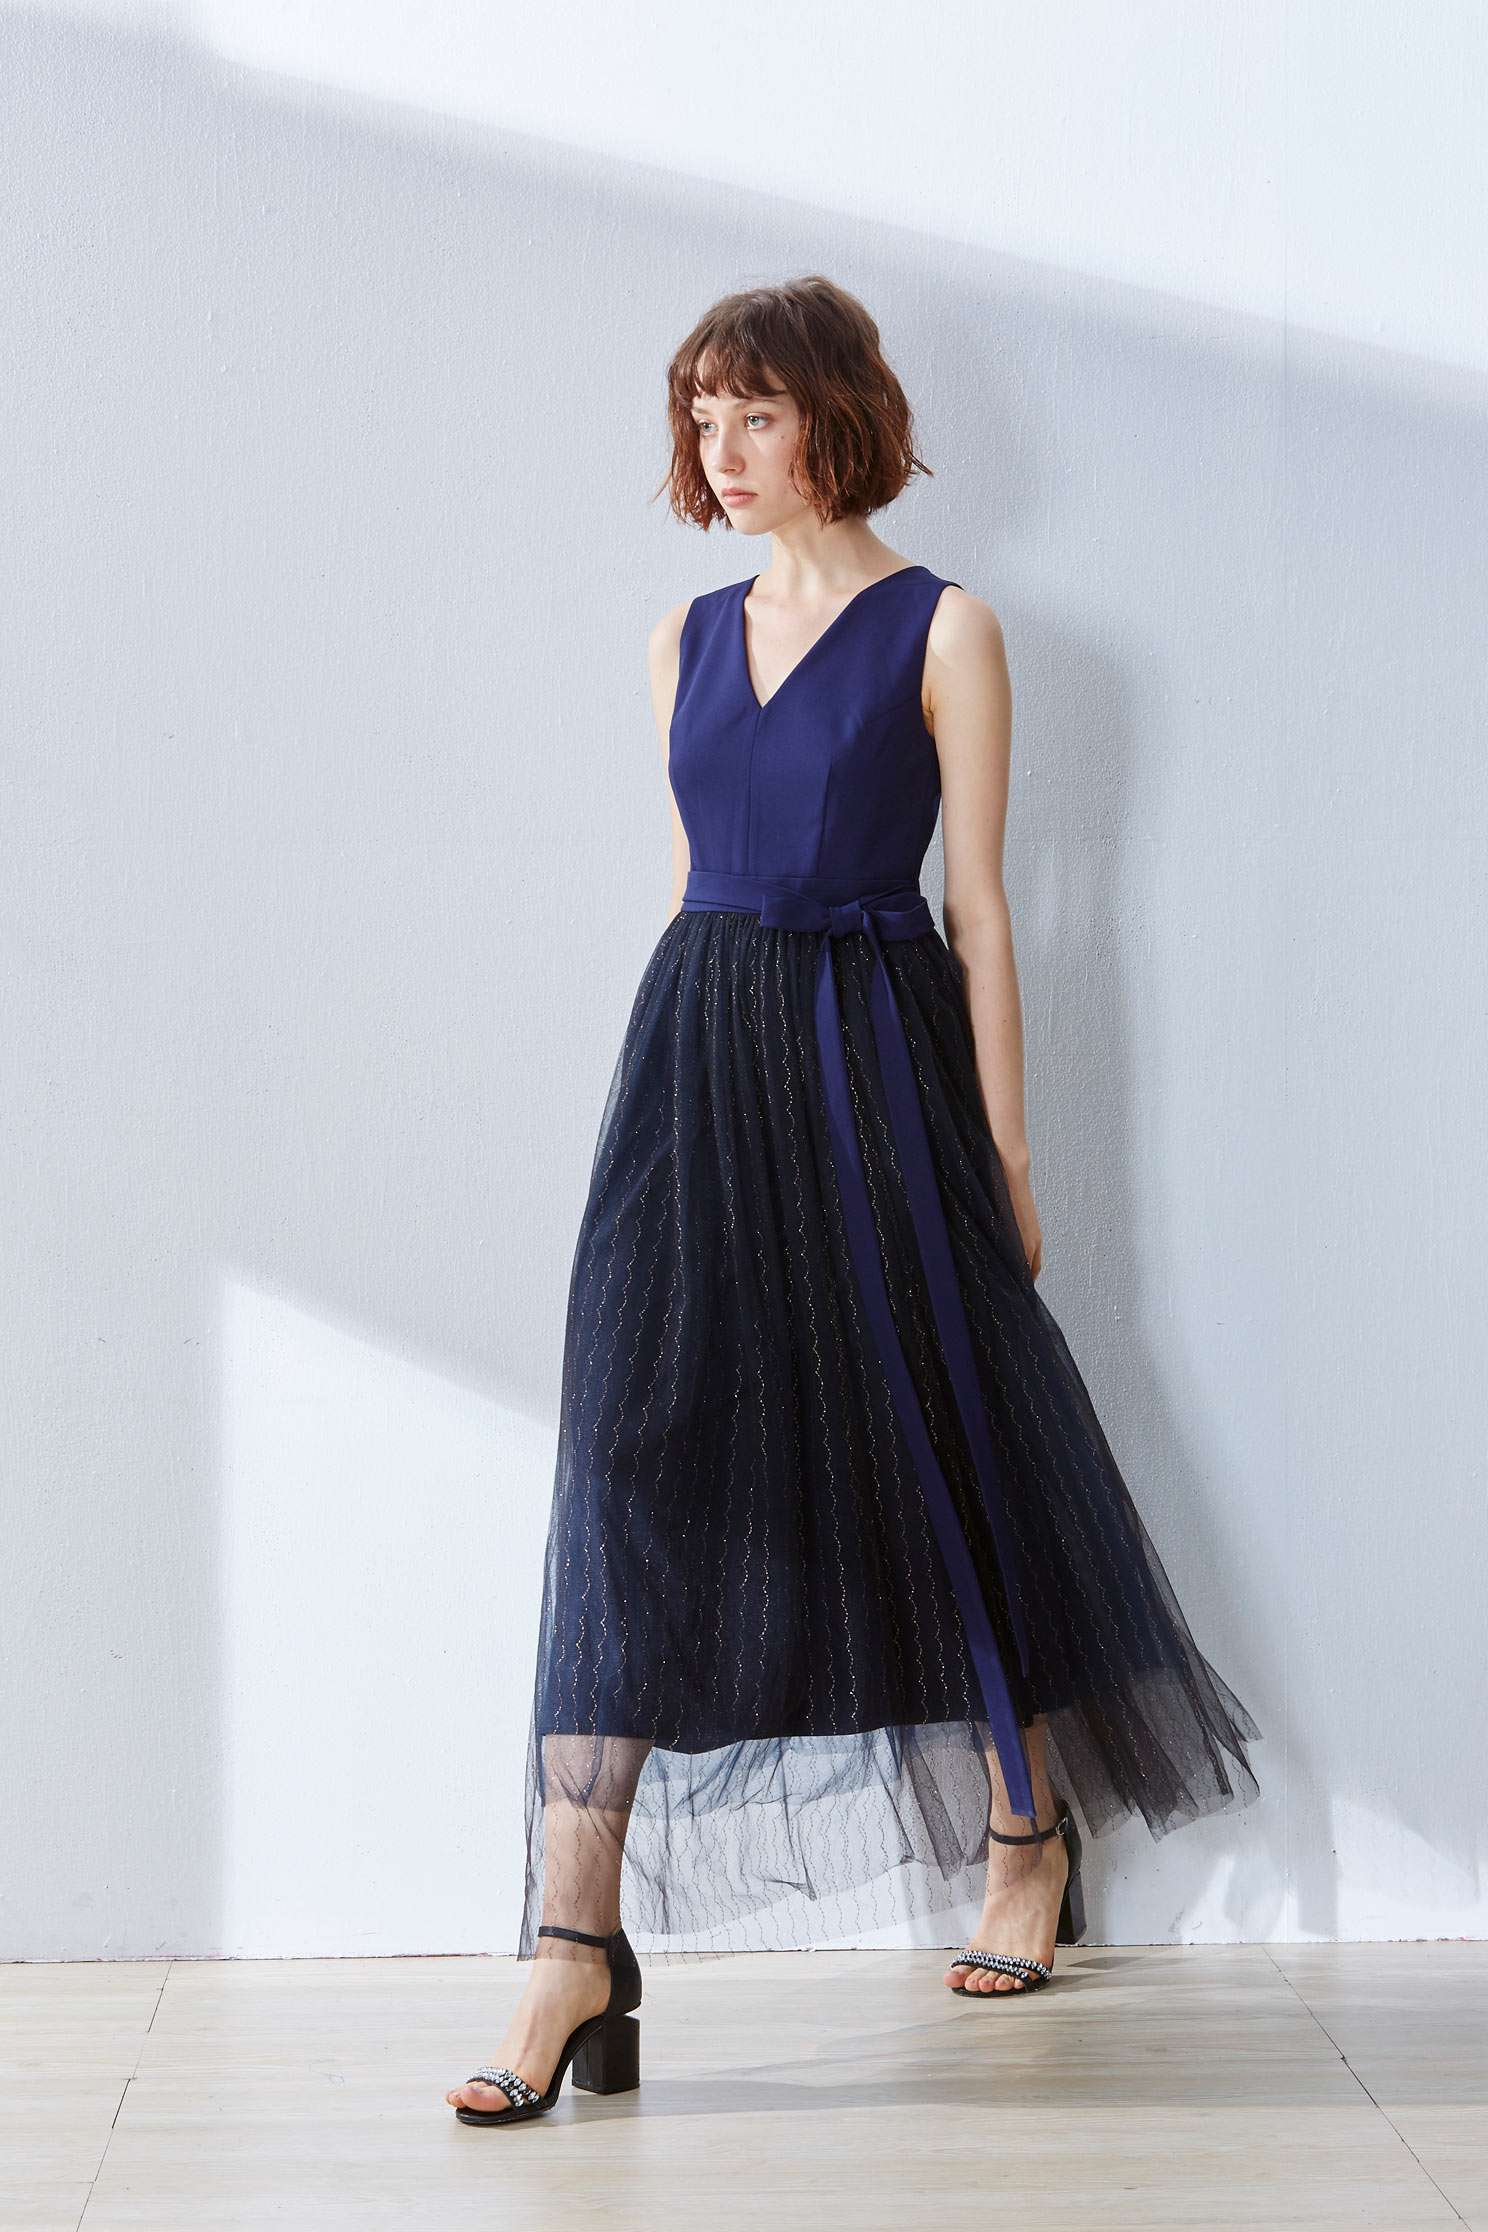 V-neck gauze stitching sleeveless dress,v-neckdress,embroidery,embroiderddress,cocktaildress,sleevelessdress,eveningwear,embroidered,perspectivedress